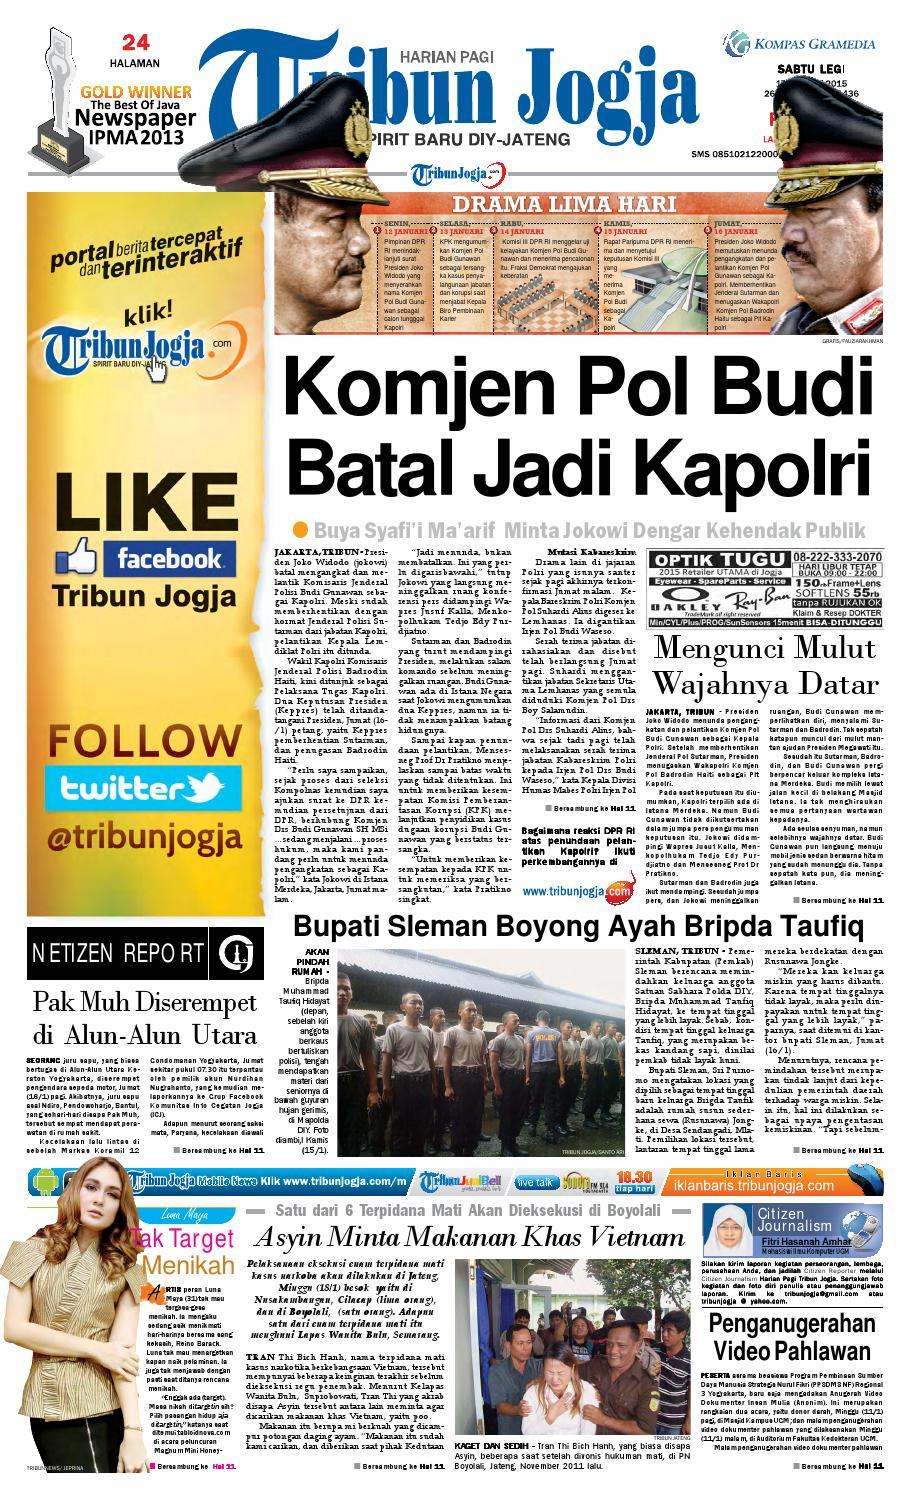 Tribunjogja 17-01-2015 by tribun jogja - issuu 2cb2681765